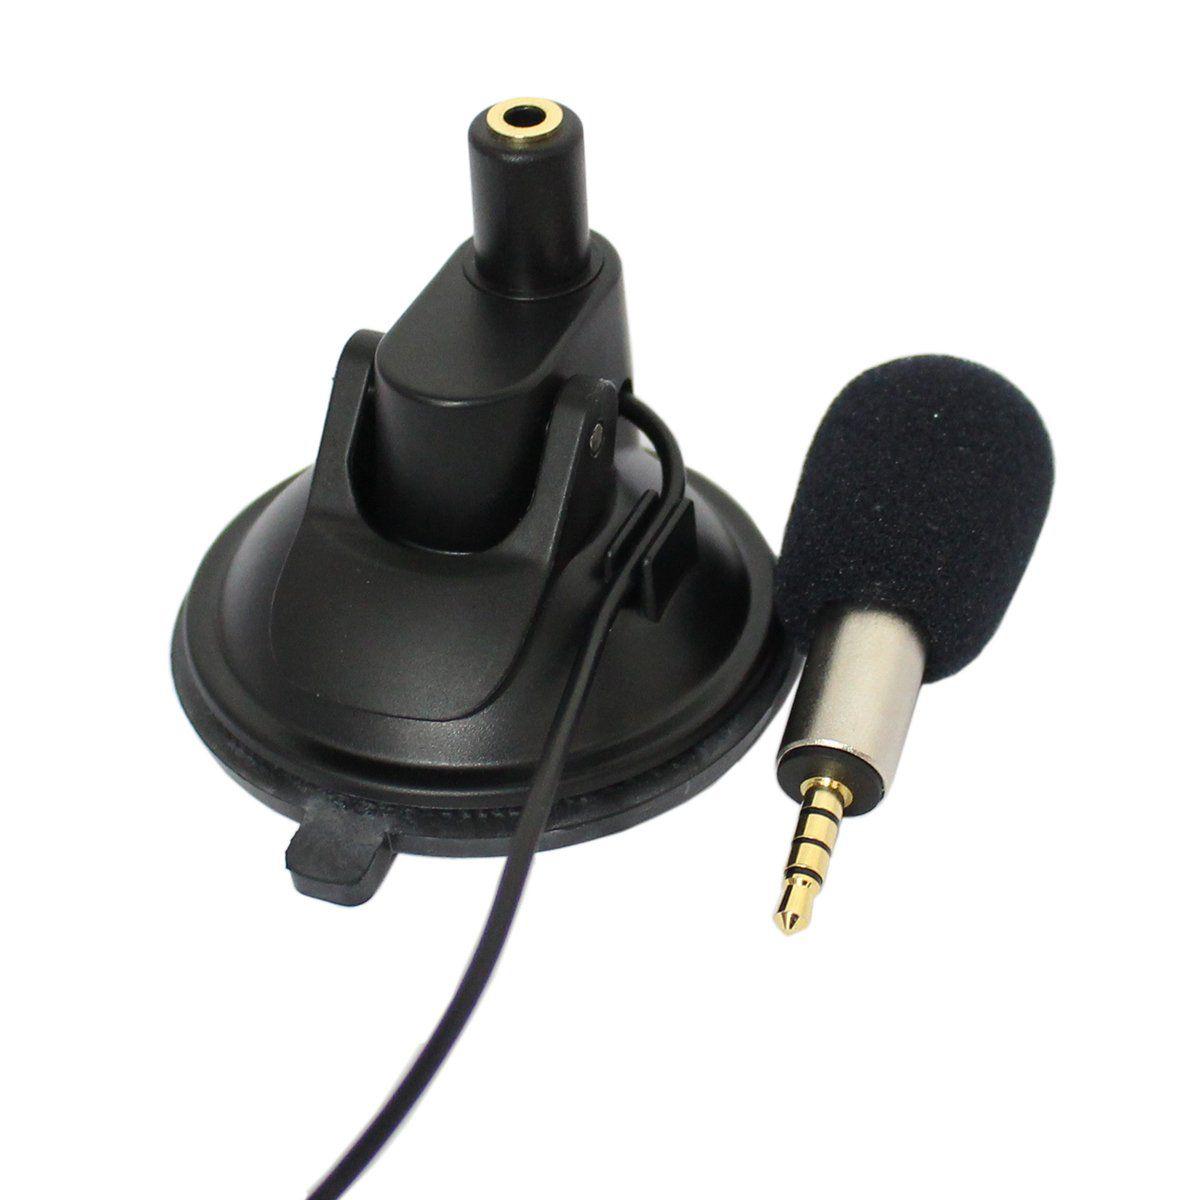 Microfone c/ Fio p/ Celular / Tablet SC29 - YOGA